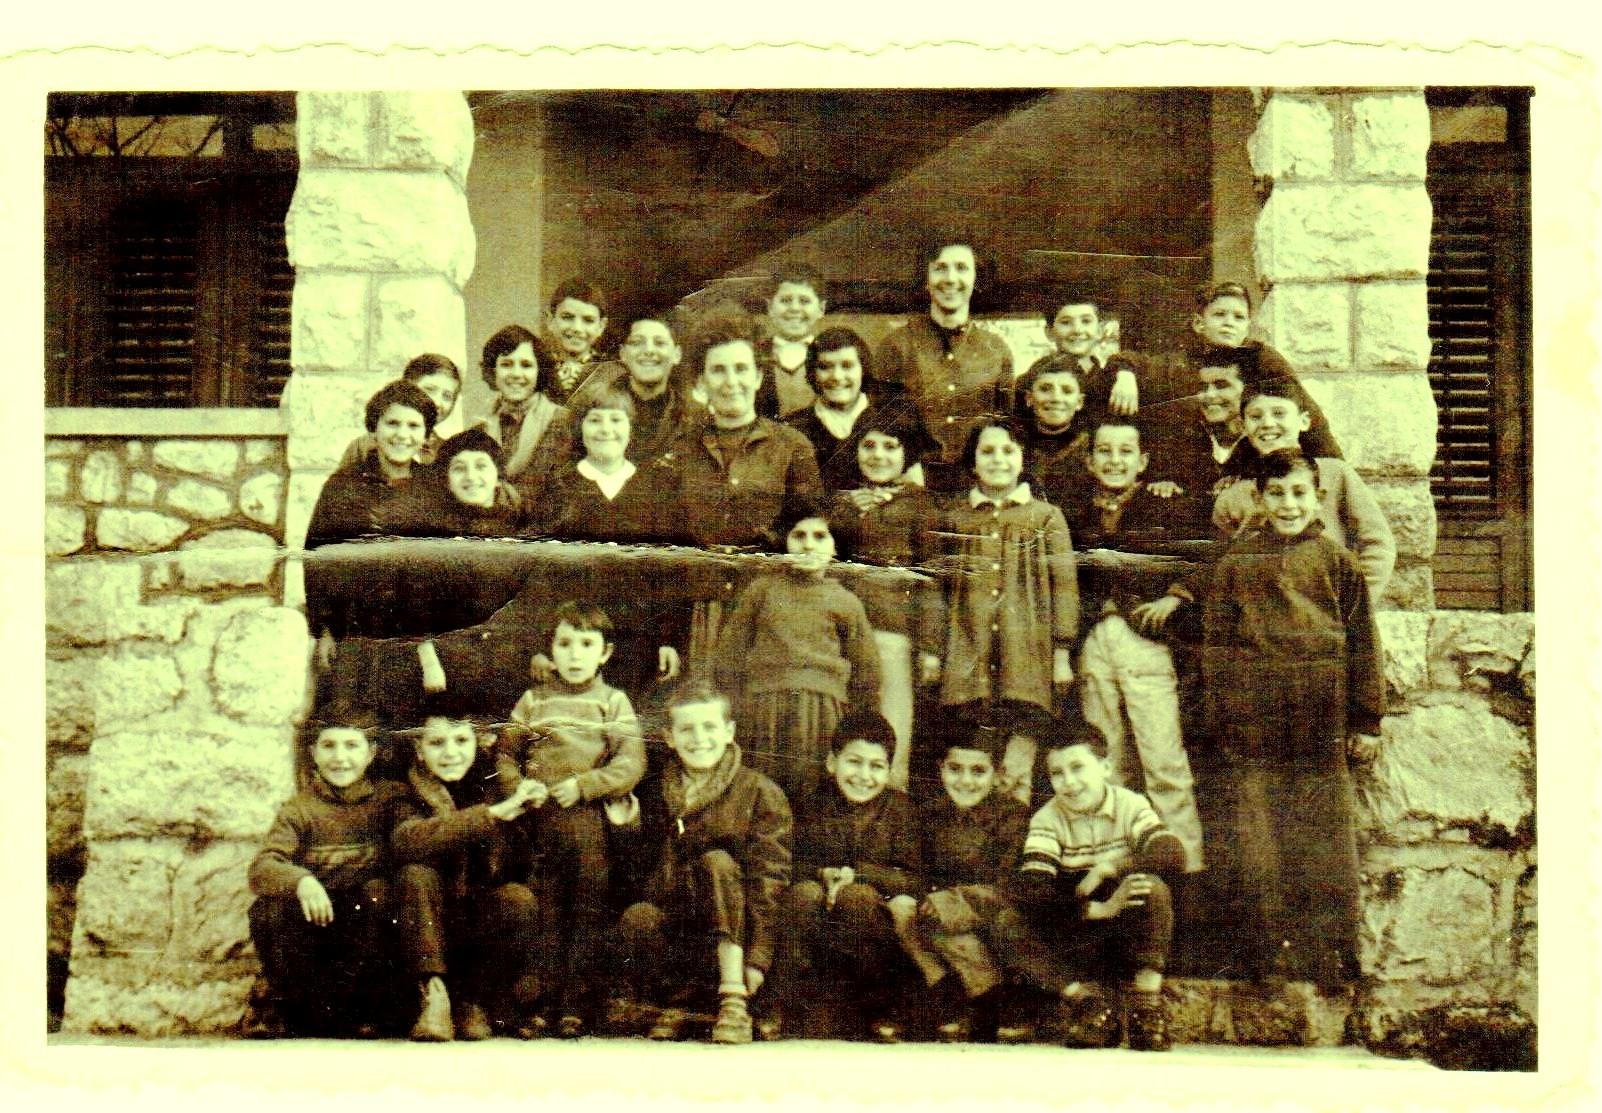 Foto privatna arhiva Ljubomira Taneva